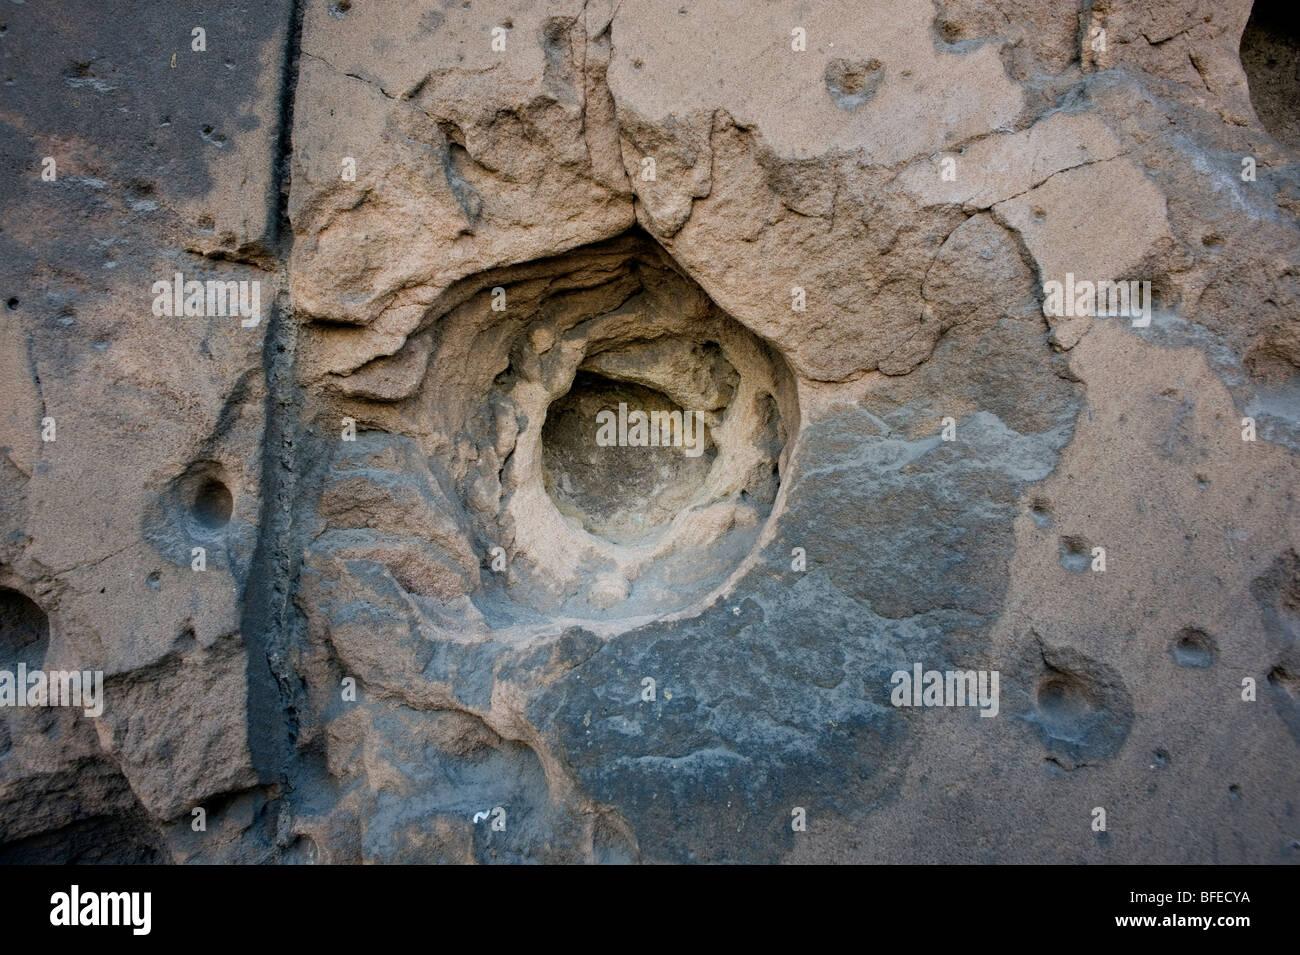 Berlin,Museum Island,bullet holes,DDR,2009 - Stock Image